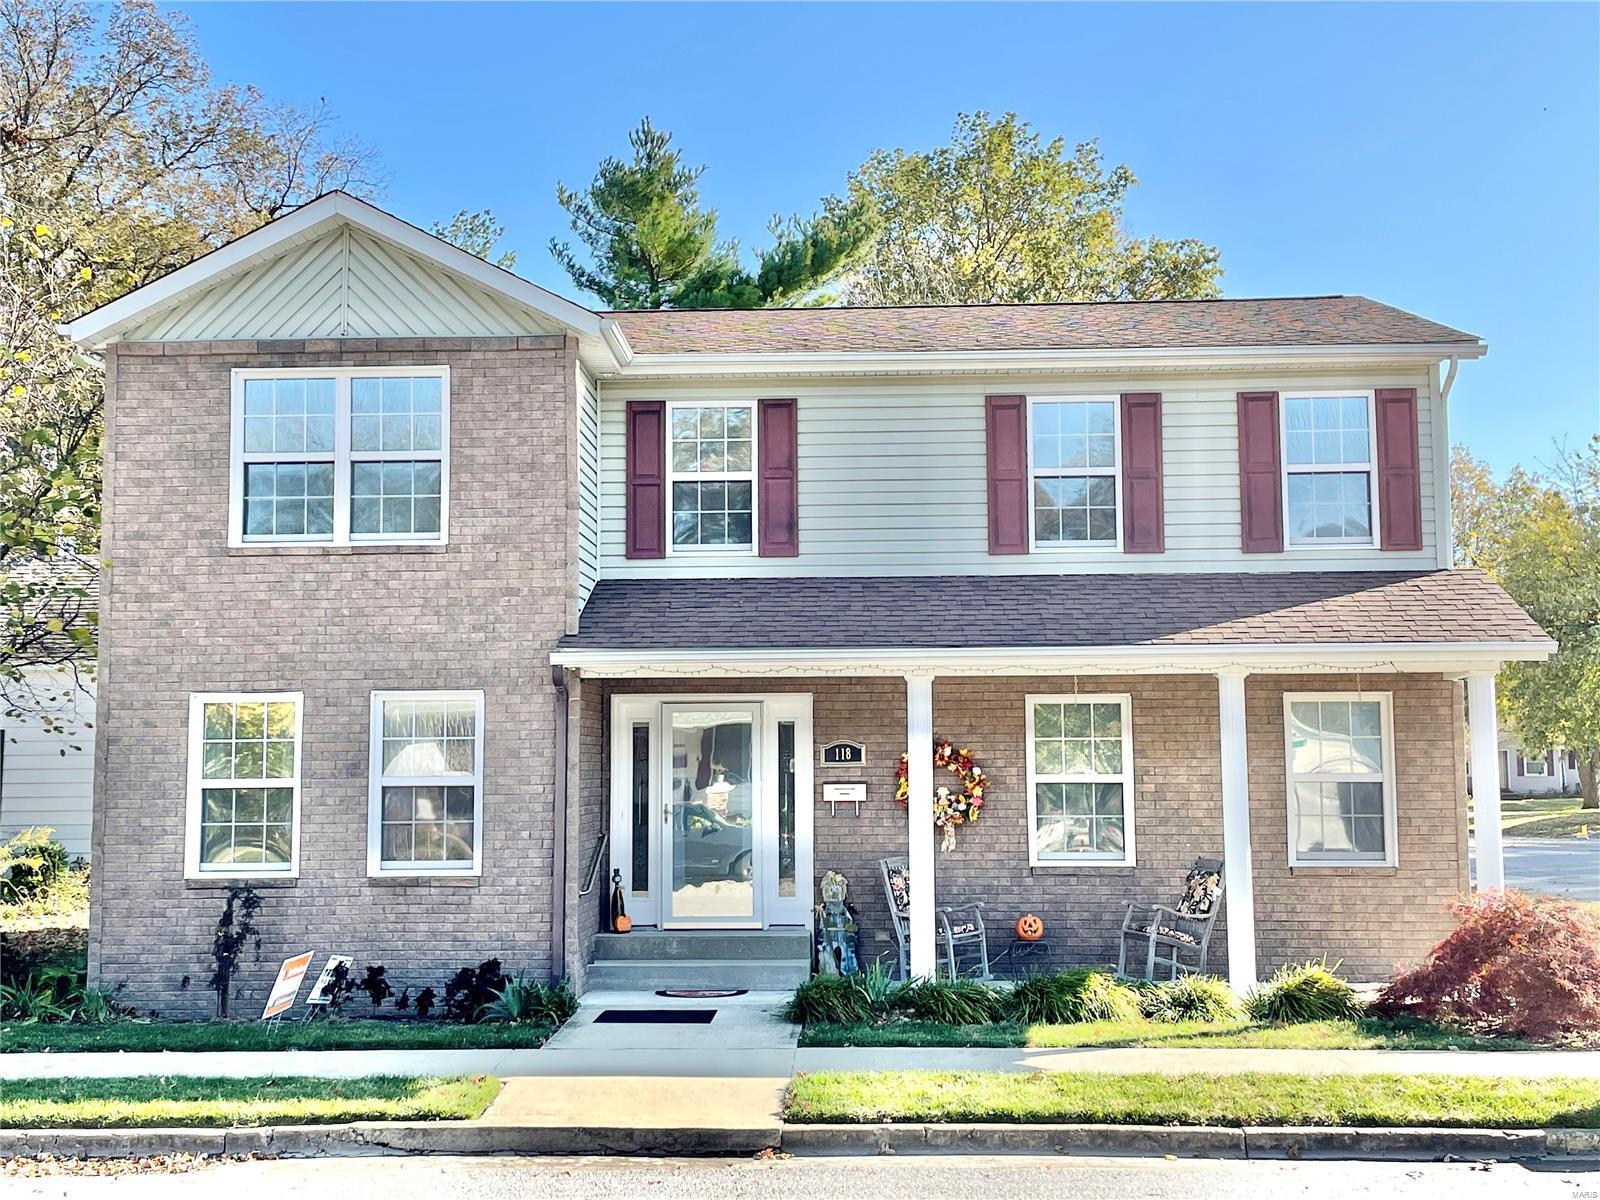 118 S Main Property Photo - Trenton, IL real estate listing